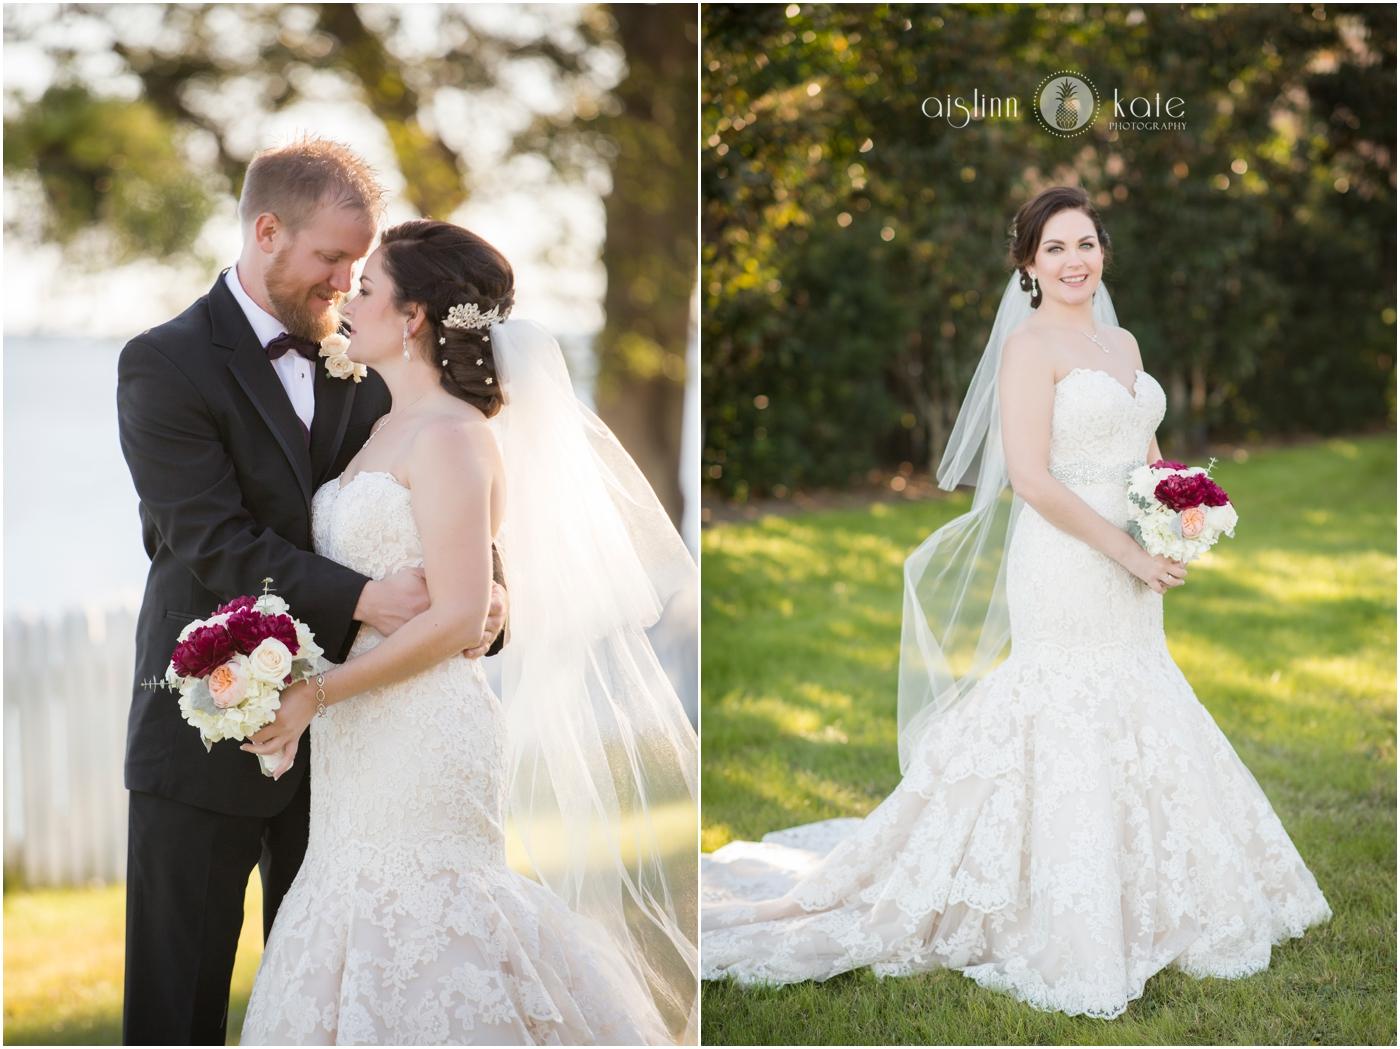 Pensacola-Destin-Wedding-Photographer_9758.jpg